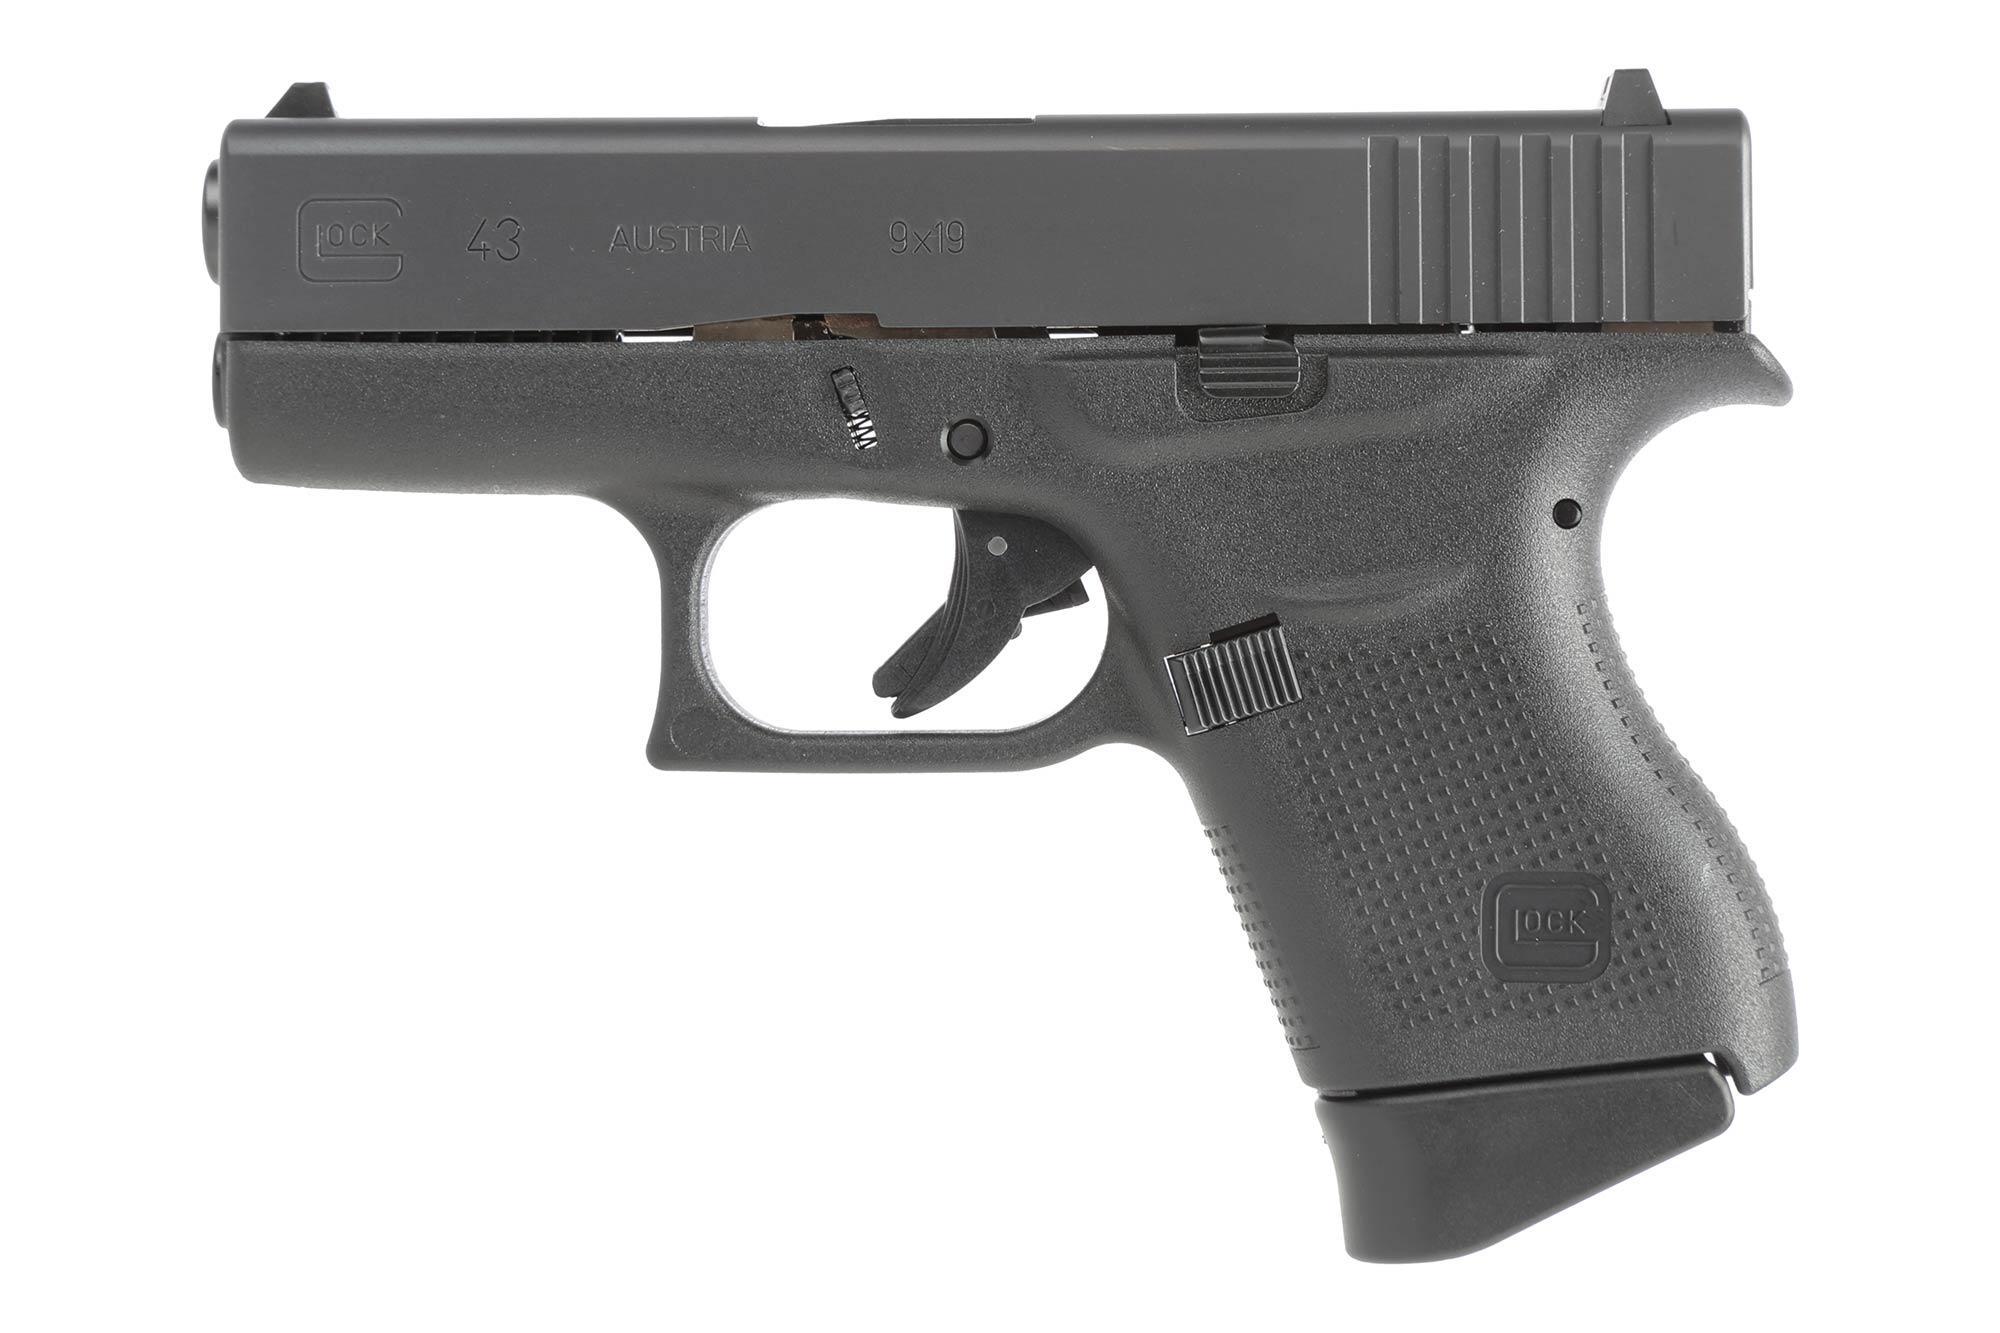 Glock G43 9mm Subcompact Pistol - 6-Round UI4350201  Glock G43 9mm S...